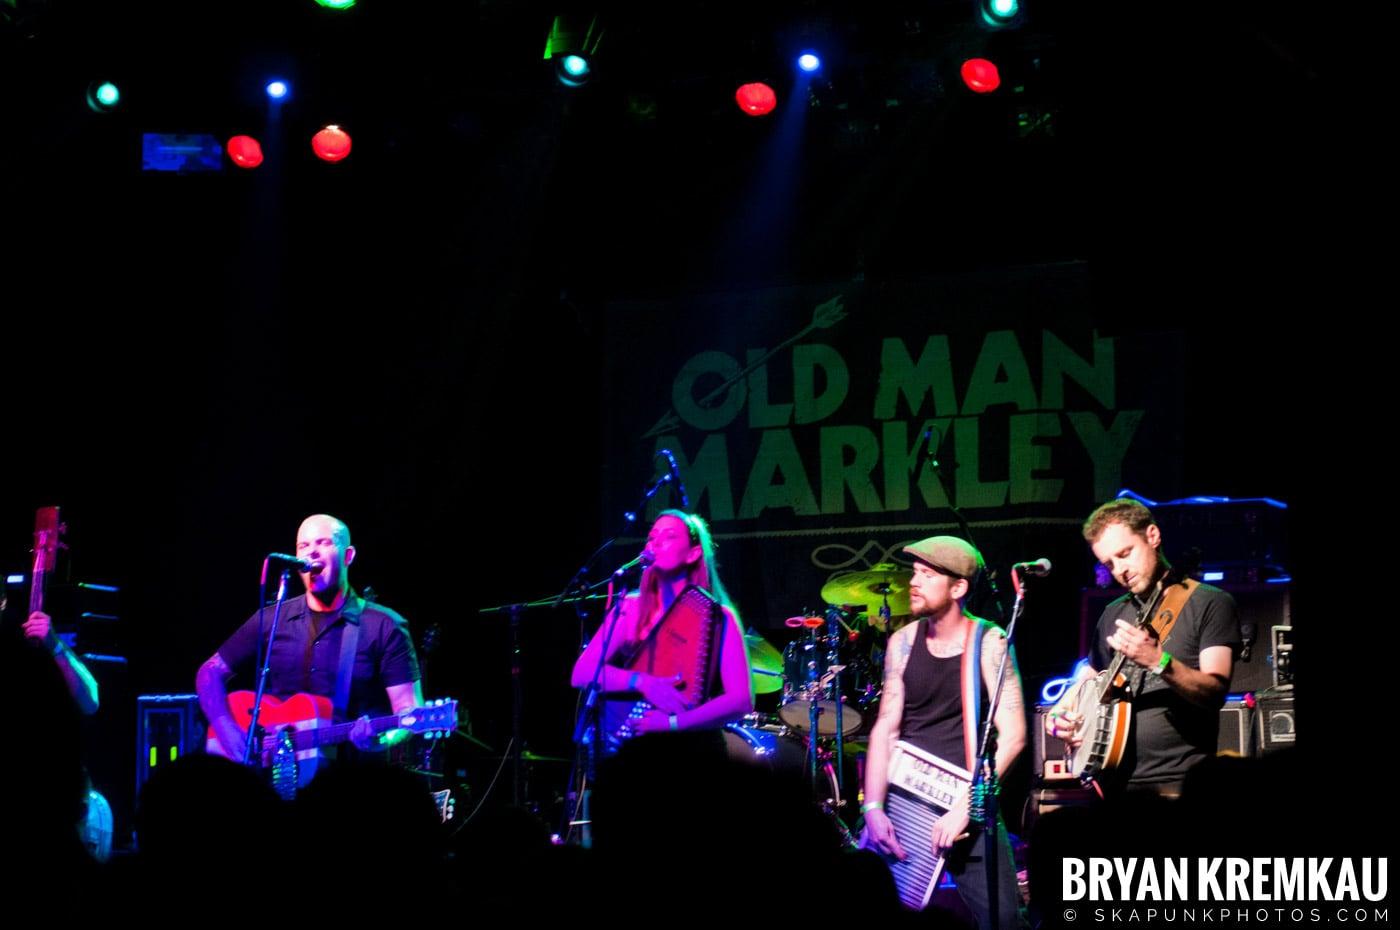 Old Man Markley @ Irving Plaza, NYC - 10.8.11 (1)